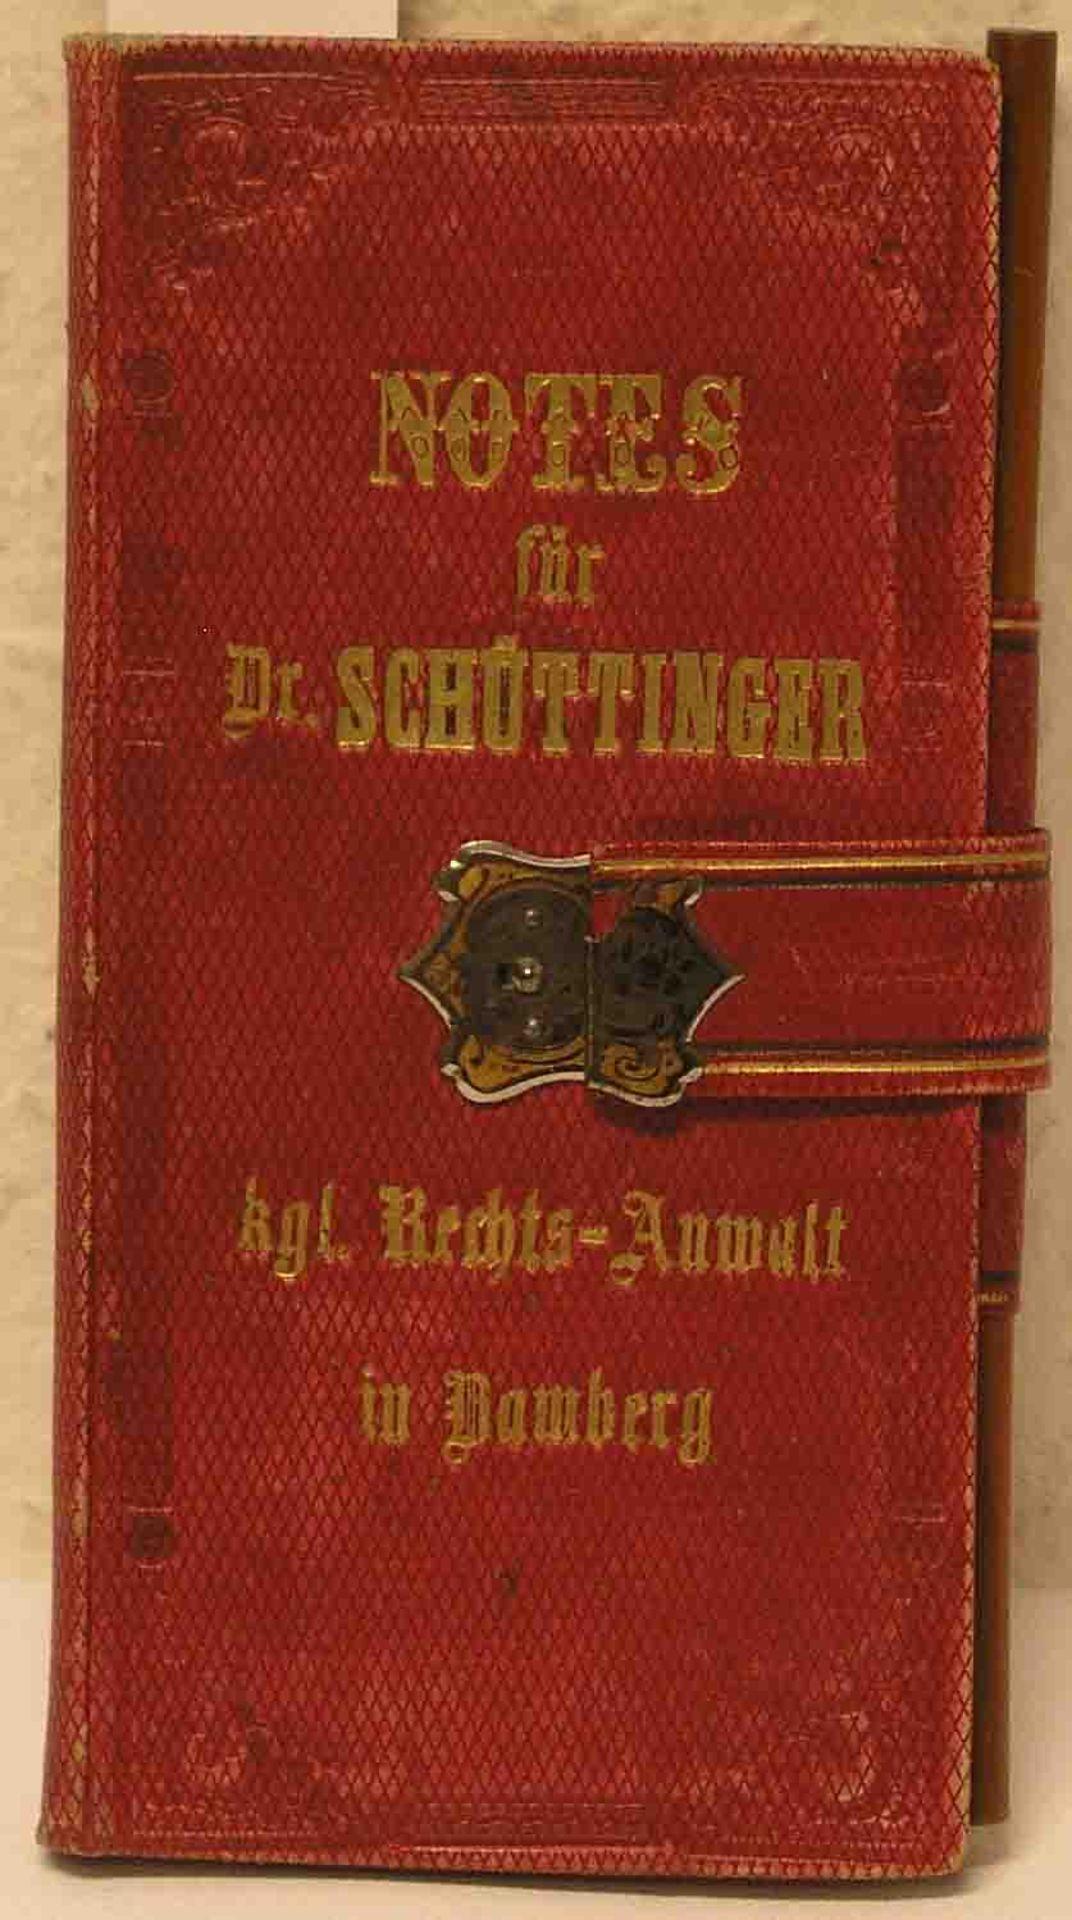 """Notes für Dr. Schüttinger, kgl."